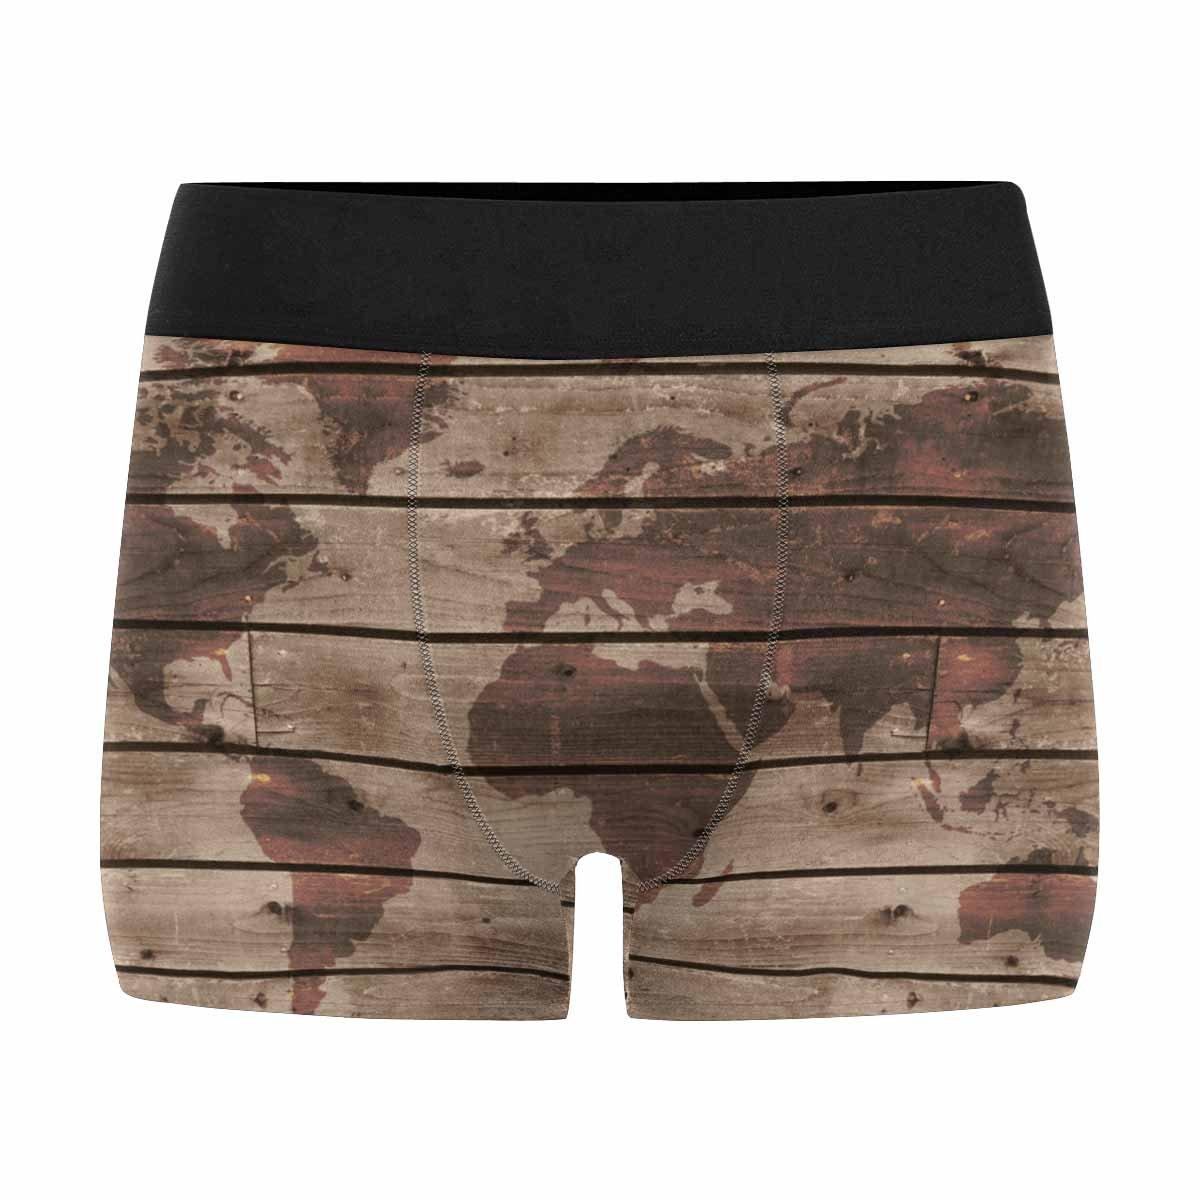 XS-3XL INTERESTPRINT Boxer Briefs Mens Underwear Old Wood Texture with World Map in Vintage Style